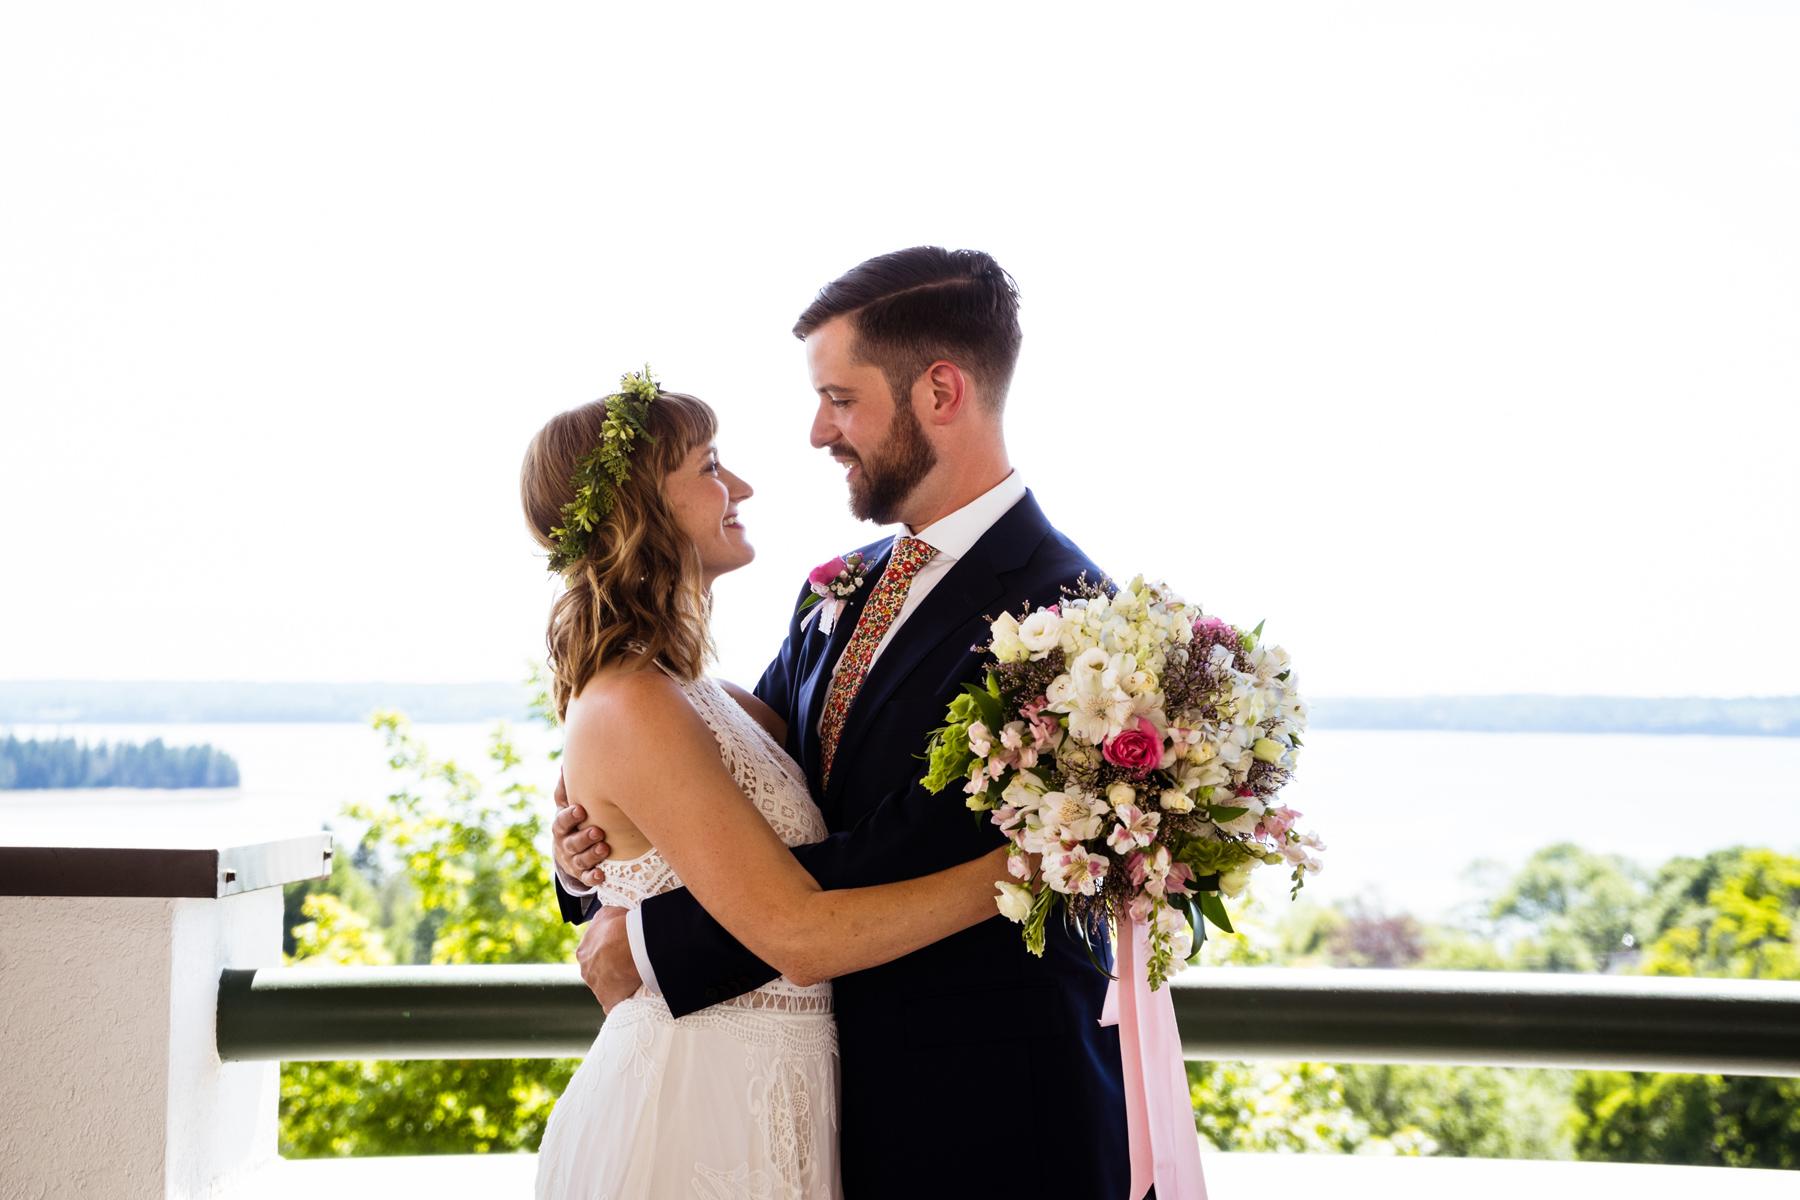 005-st-andrews-kingsbrae-gardens-wedding-photography-kandisebrown-gc2018